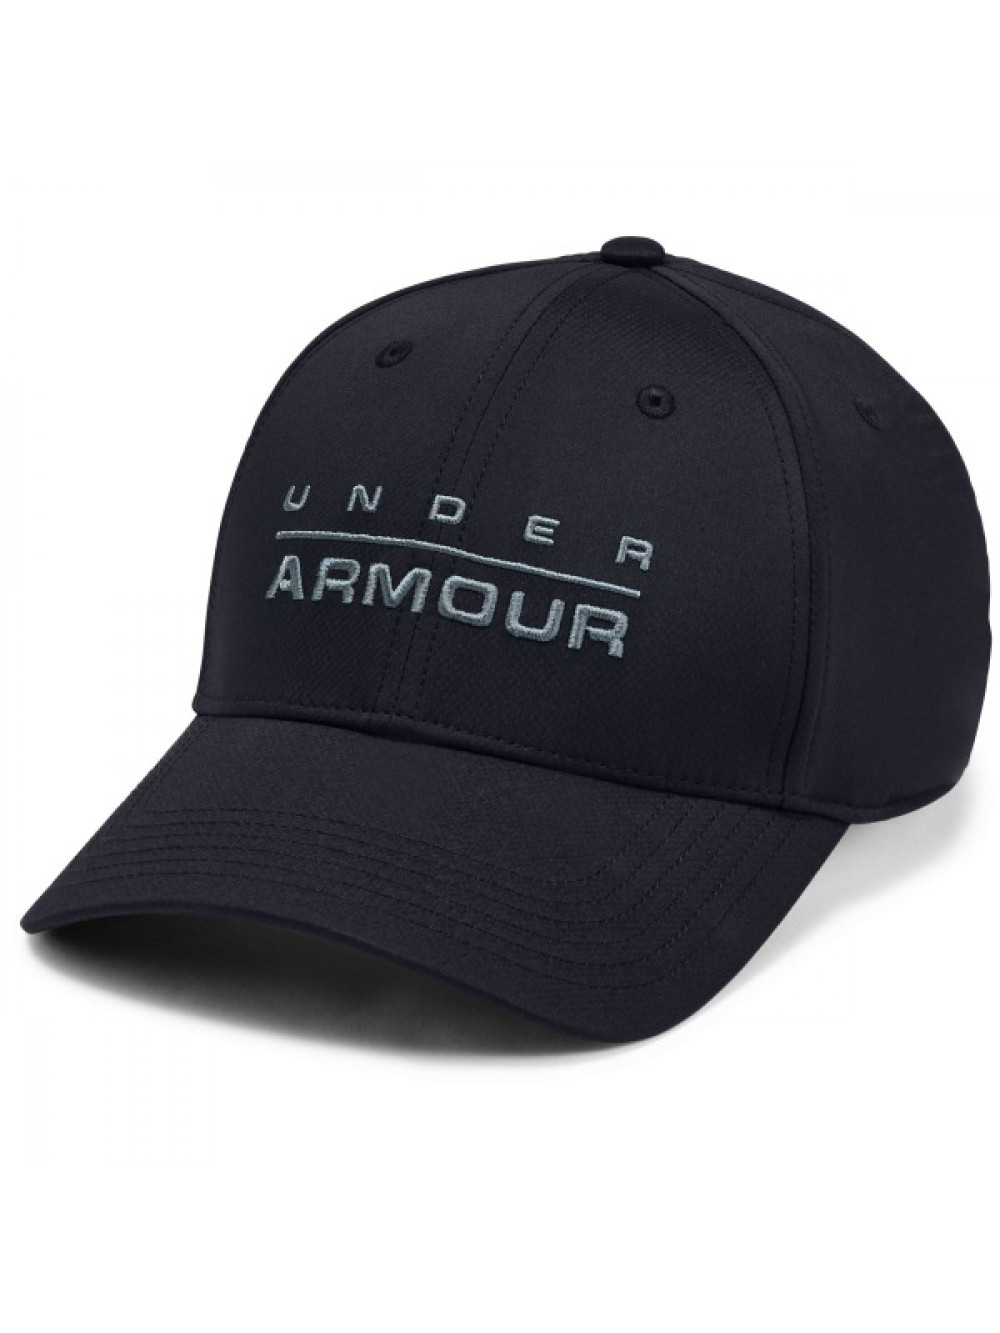 Pánska šiltovka Under Armour Wordmark STR čierna